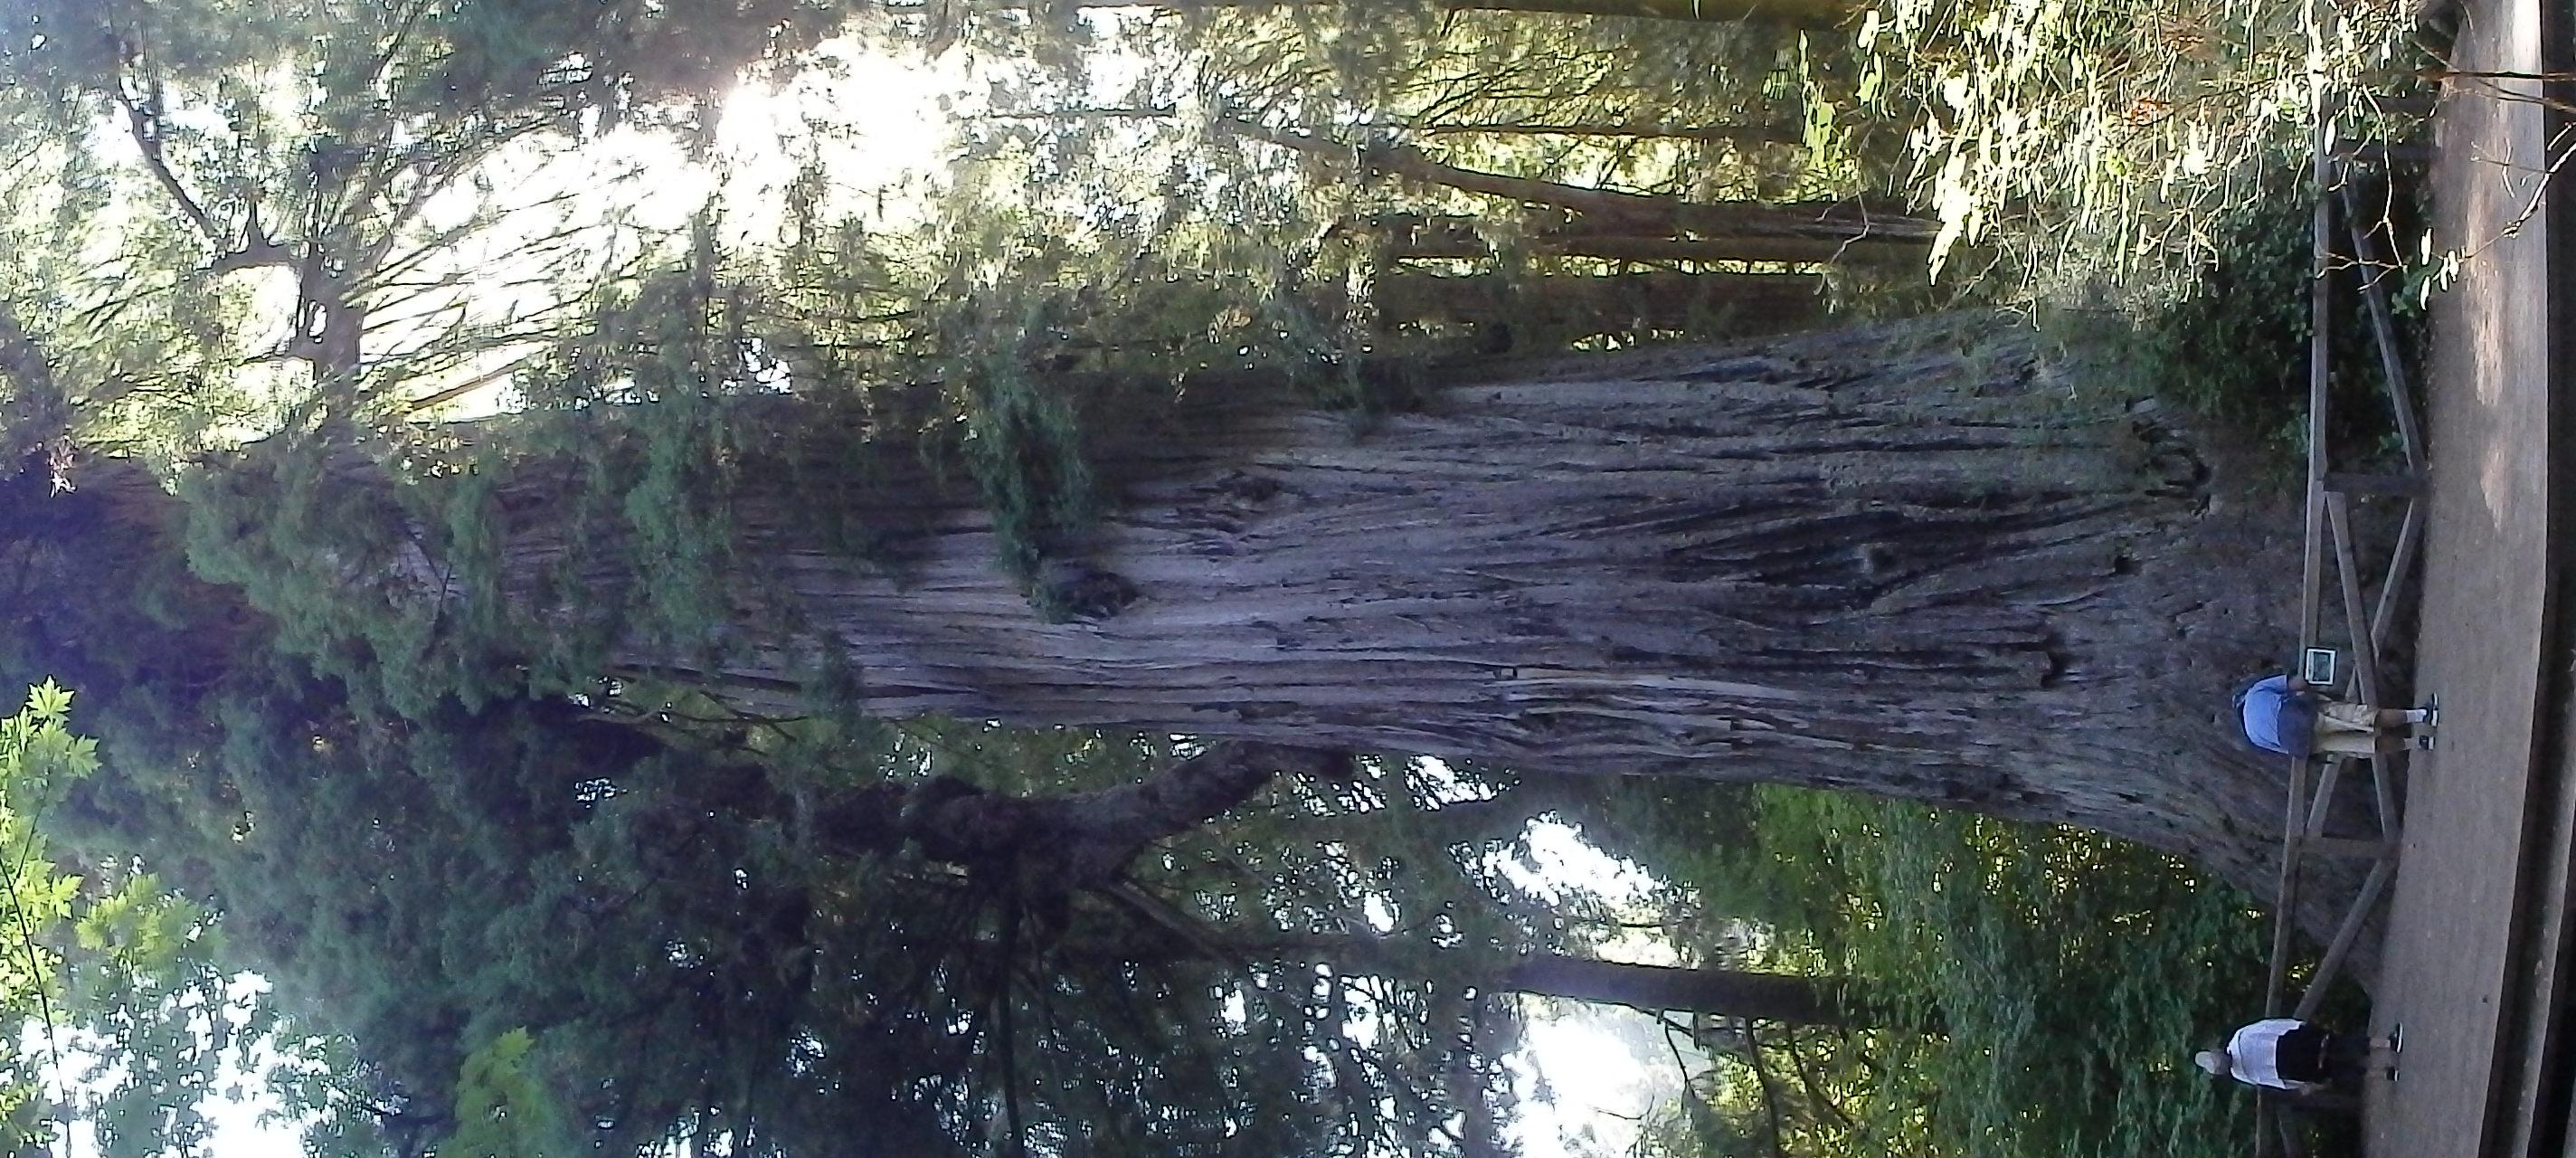 The Big Tree. 300+ feet tall, 21+ feet in diameter, 1500+ years old